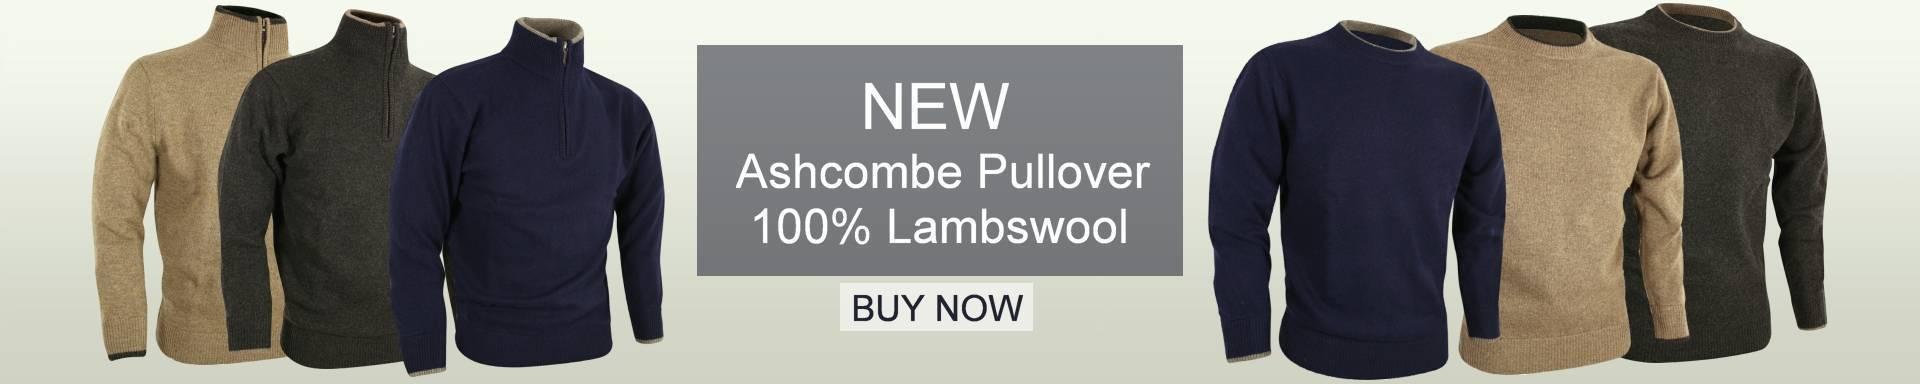 Jack Pyke Ashcombe Pullover